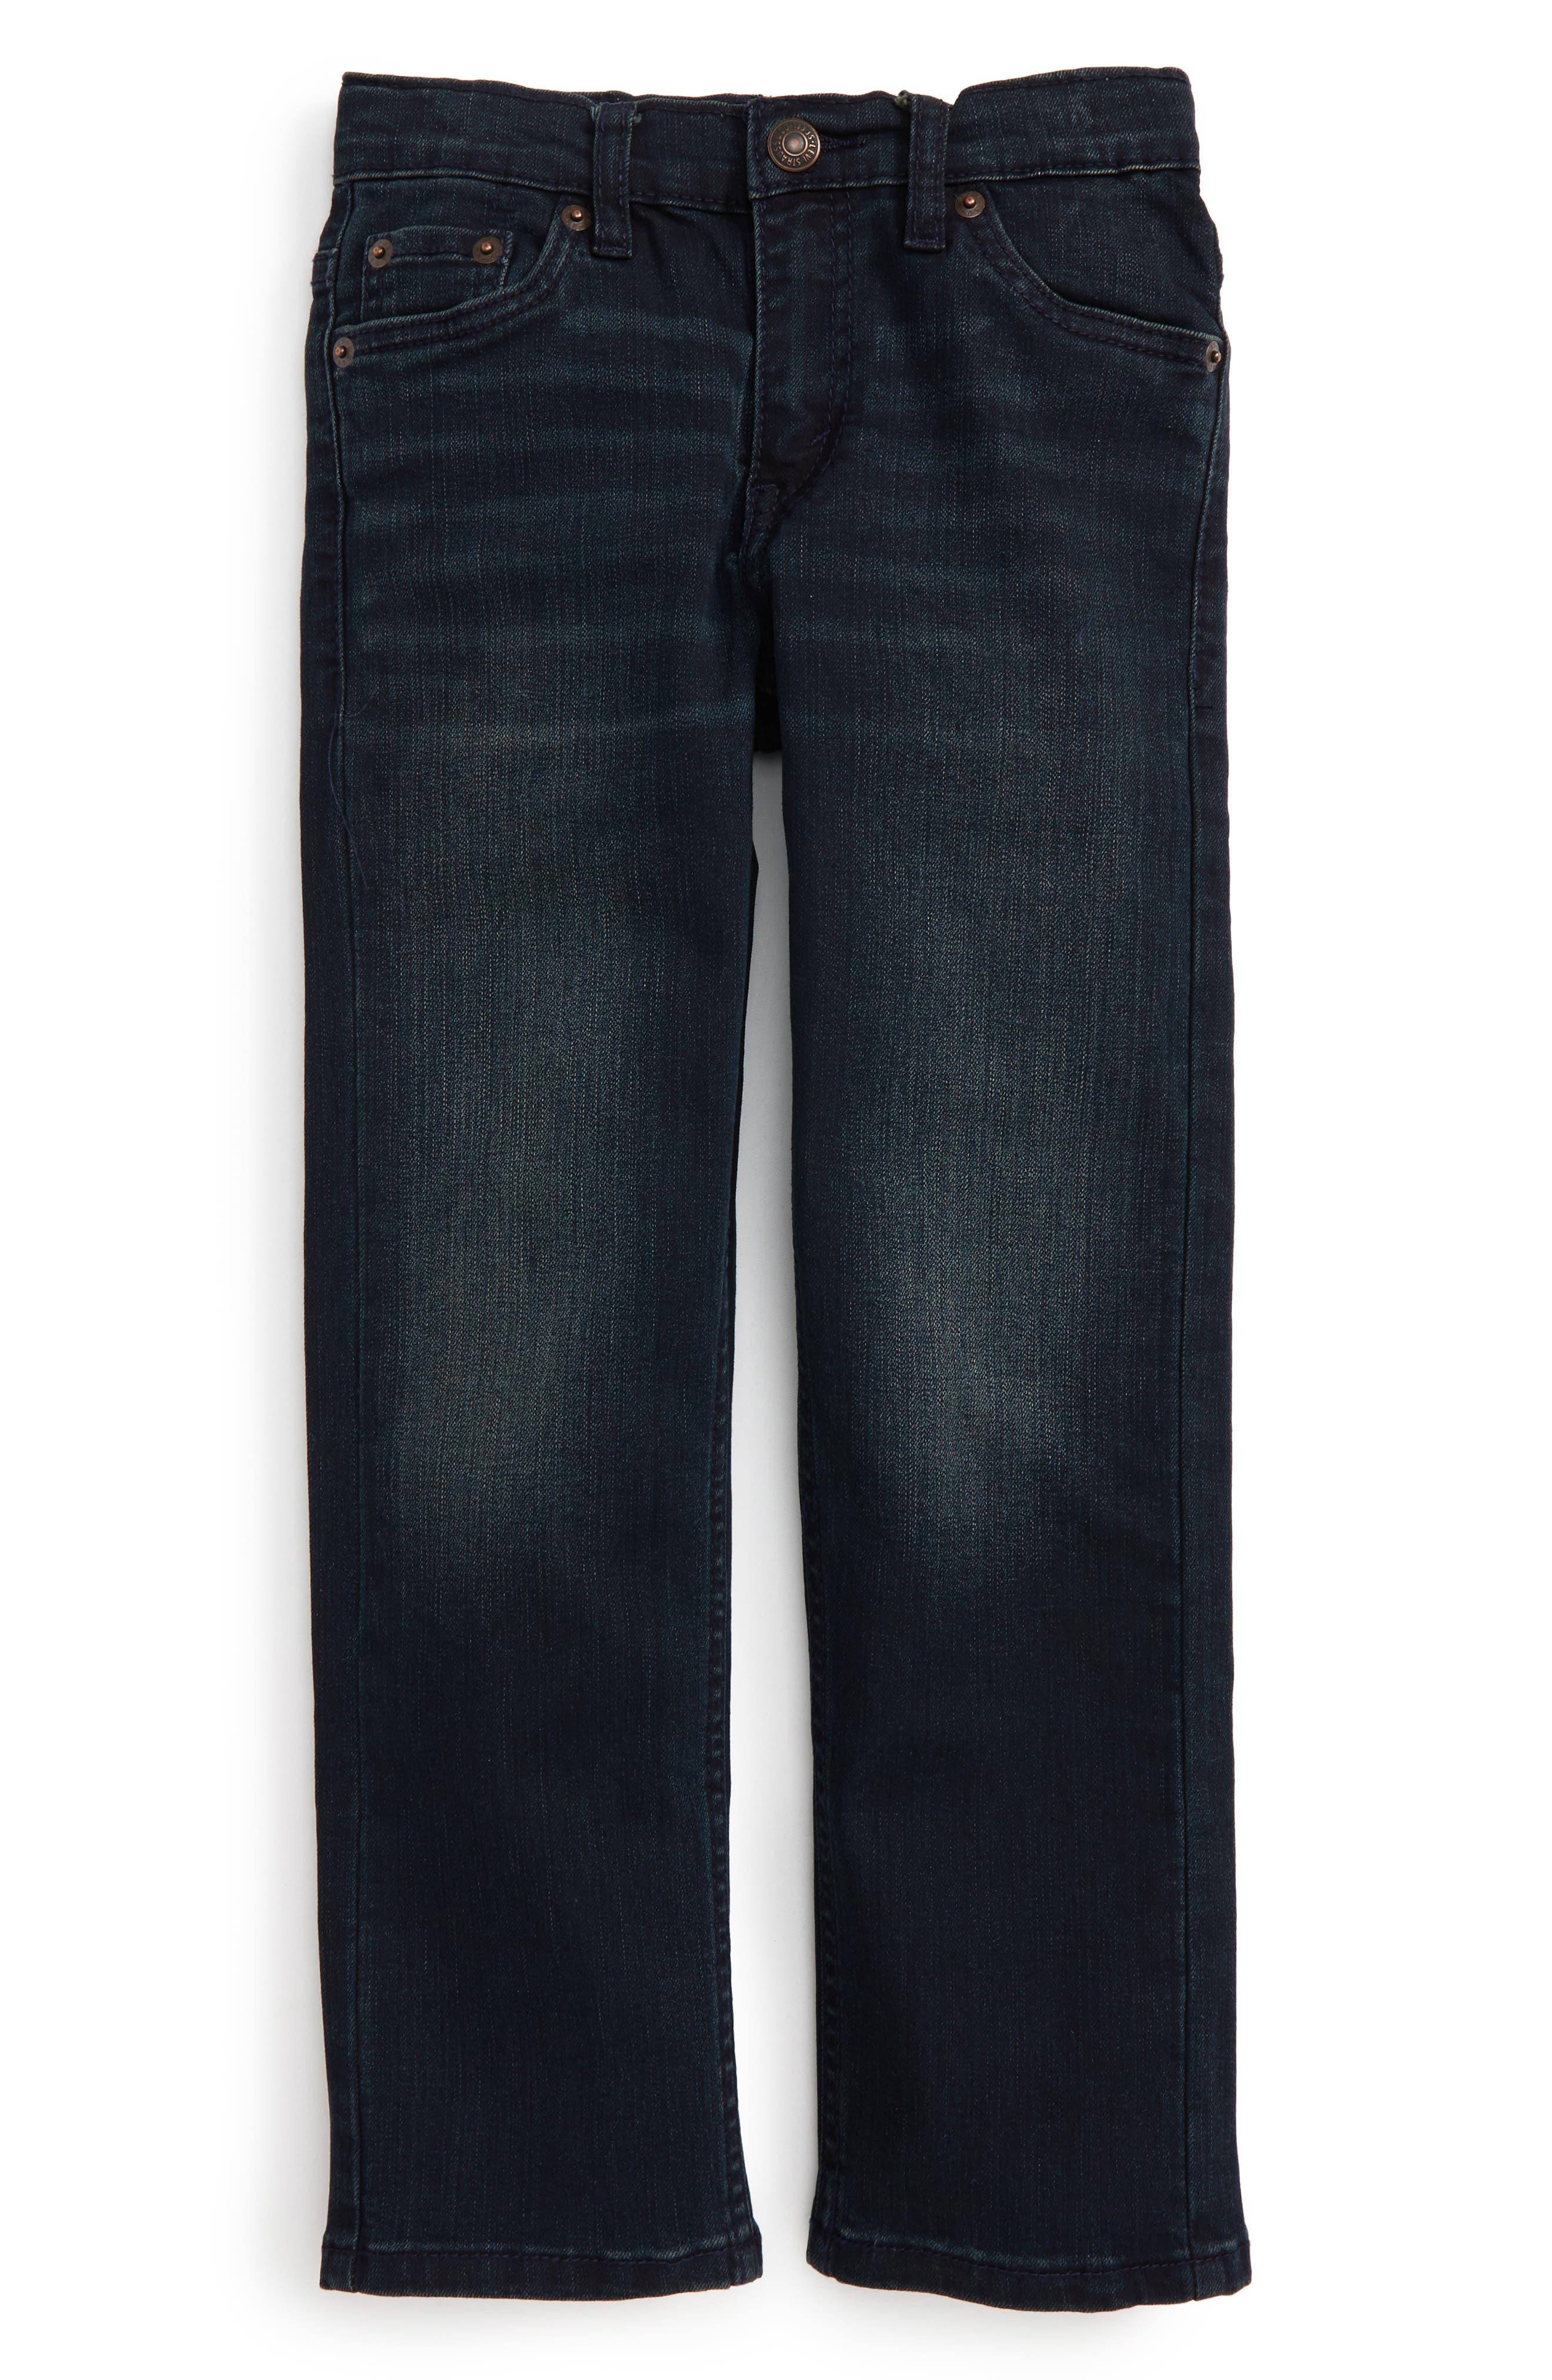 Main Image - Levi's® 511 Slim Fit Jeans (Toddler Boys & Little Boys)